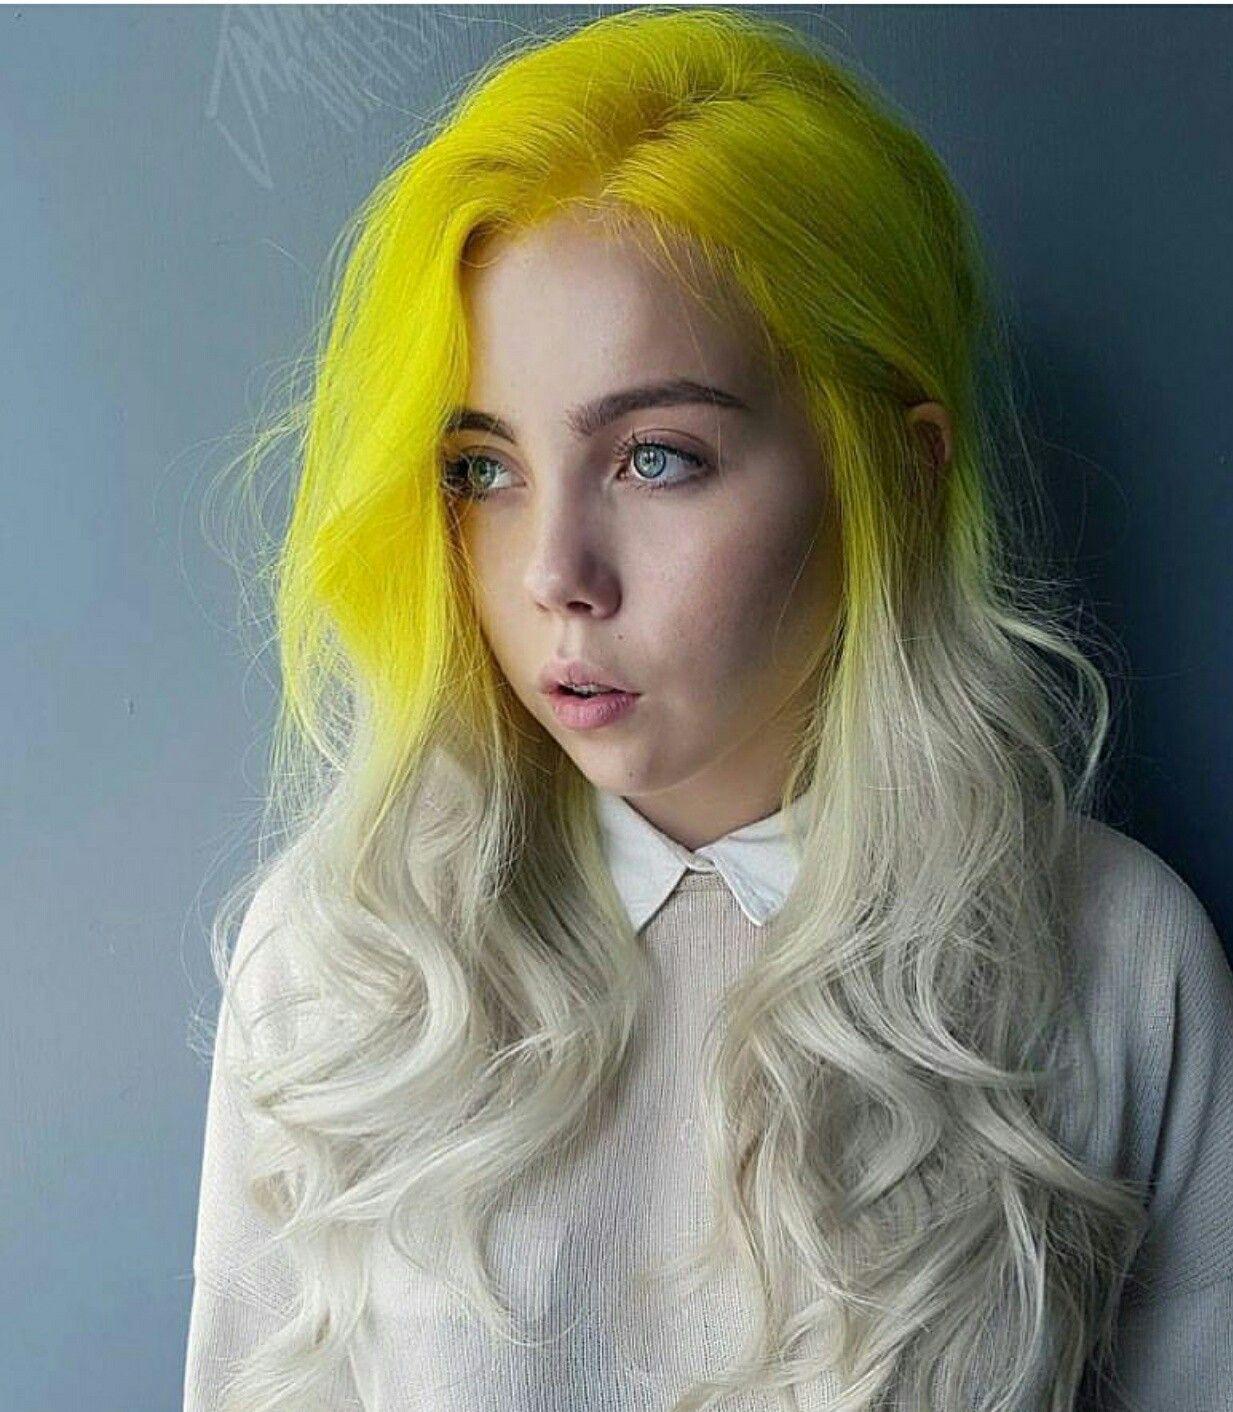 Pin by emma bowman on hairstyles pinterest rainbow hair hair